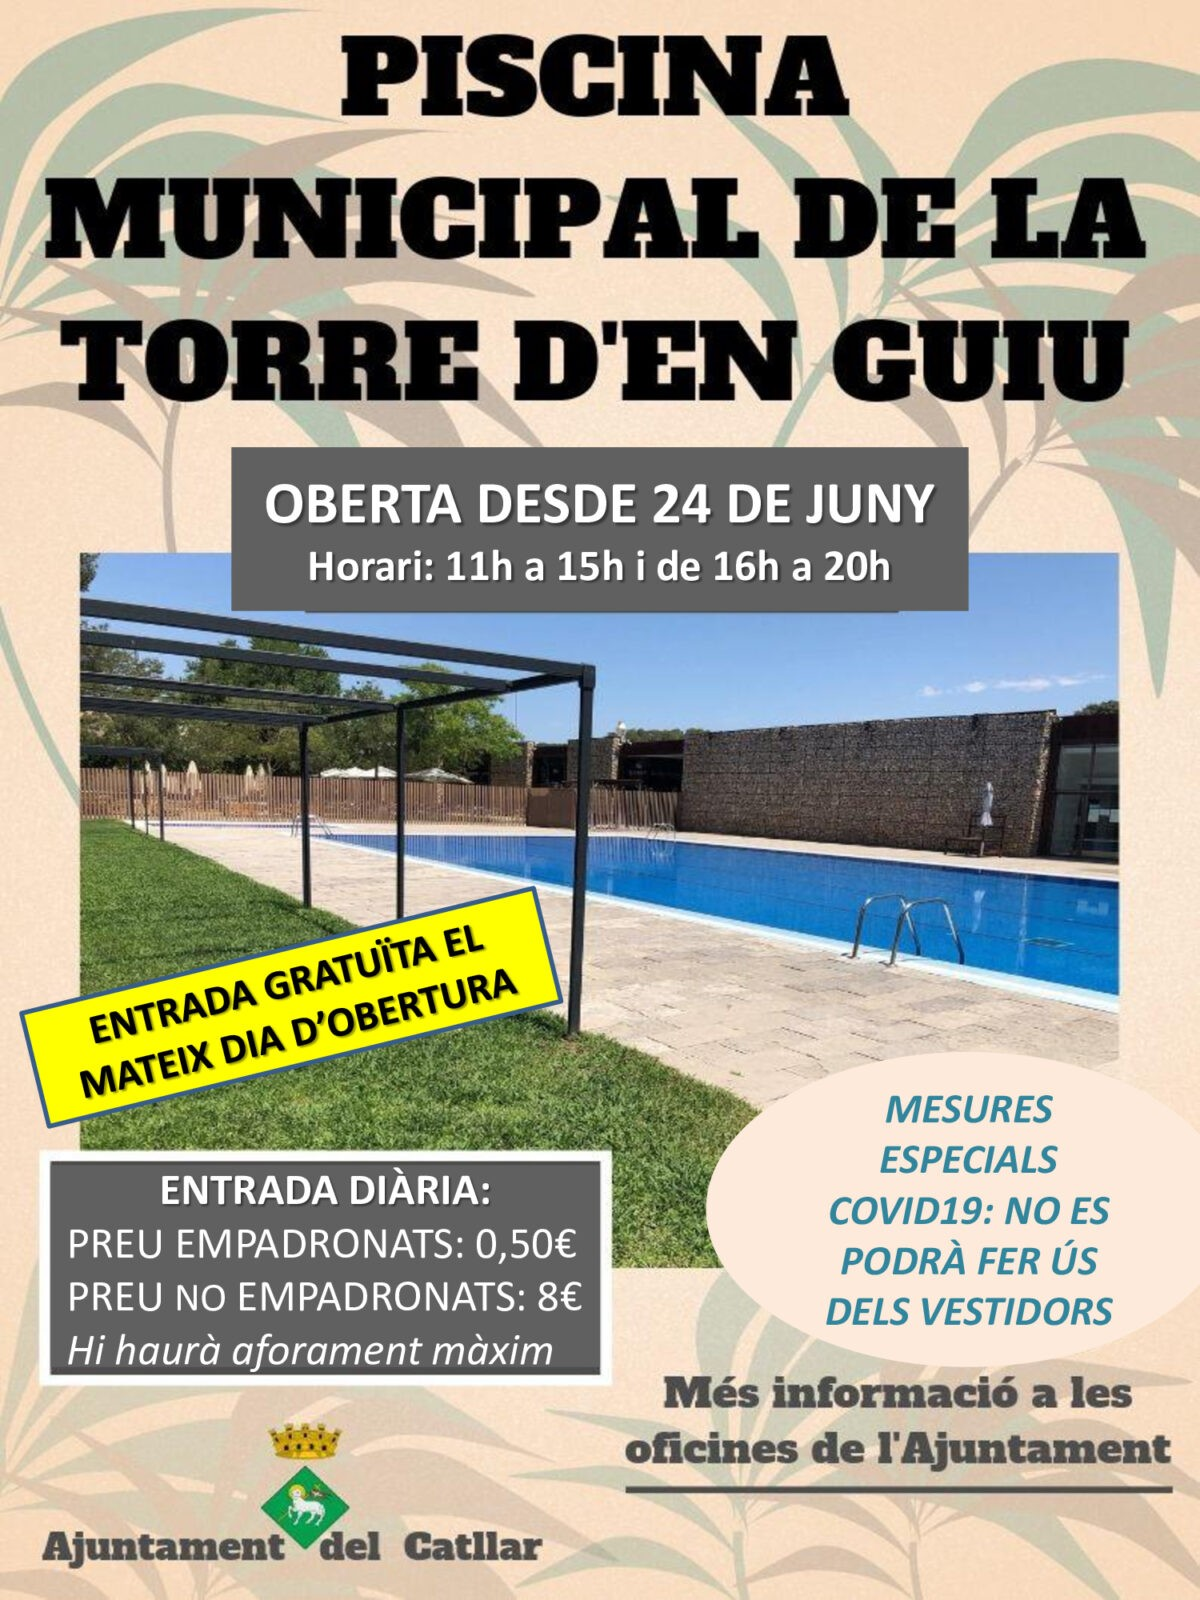 APERTURA PISCINA MUNICIPAL 24 DE JUNIO DE 2020